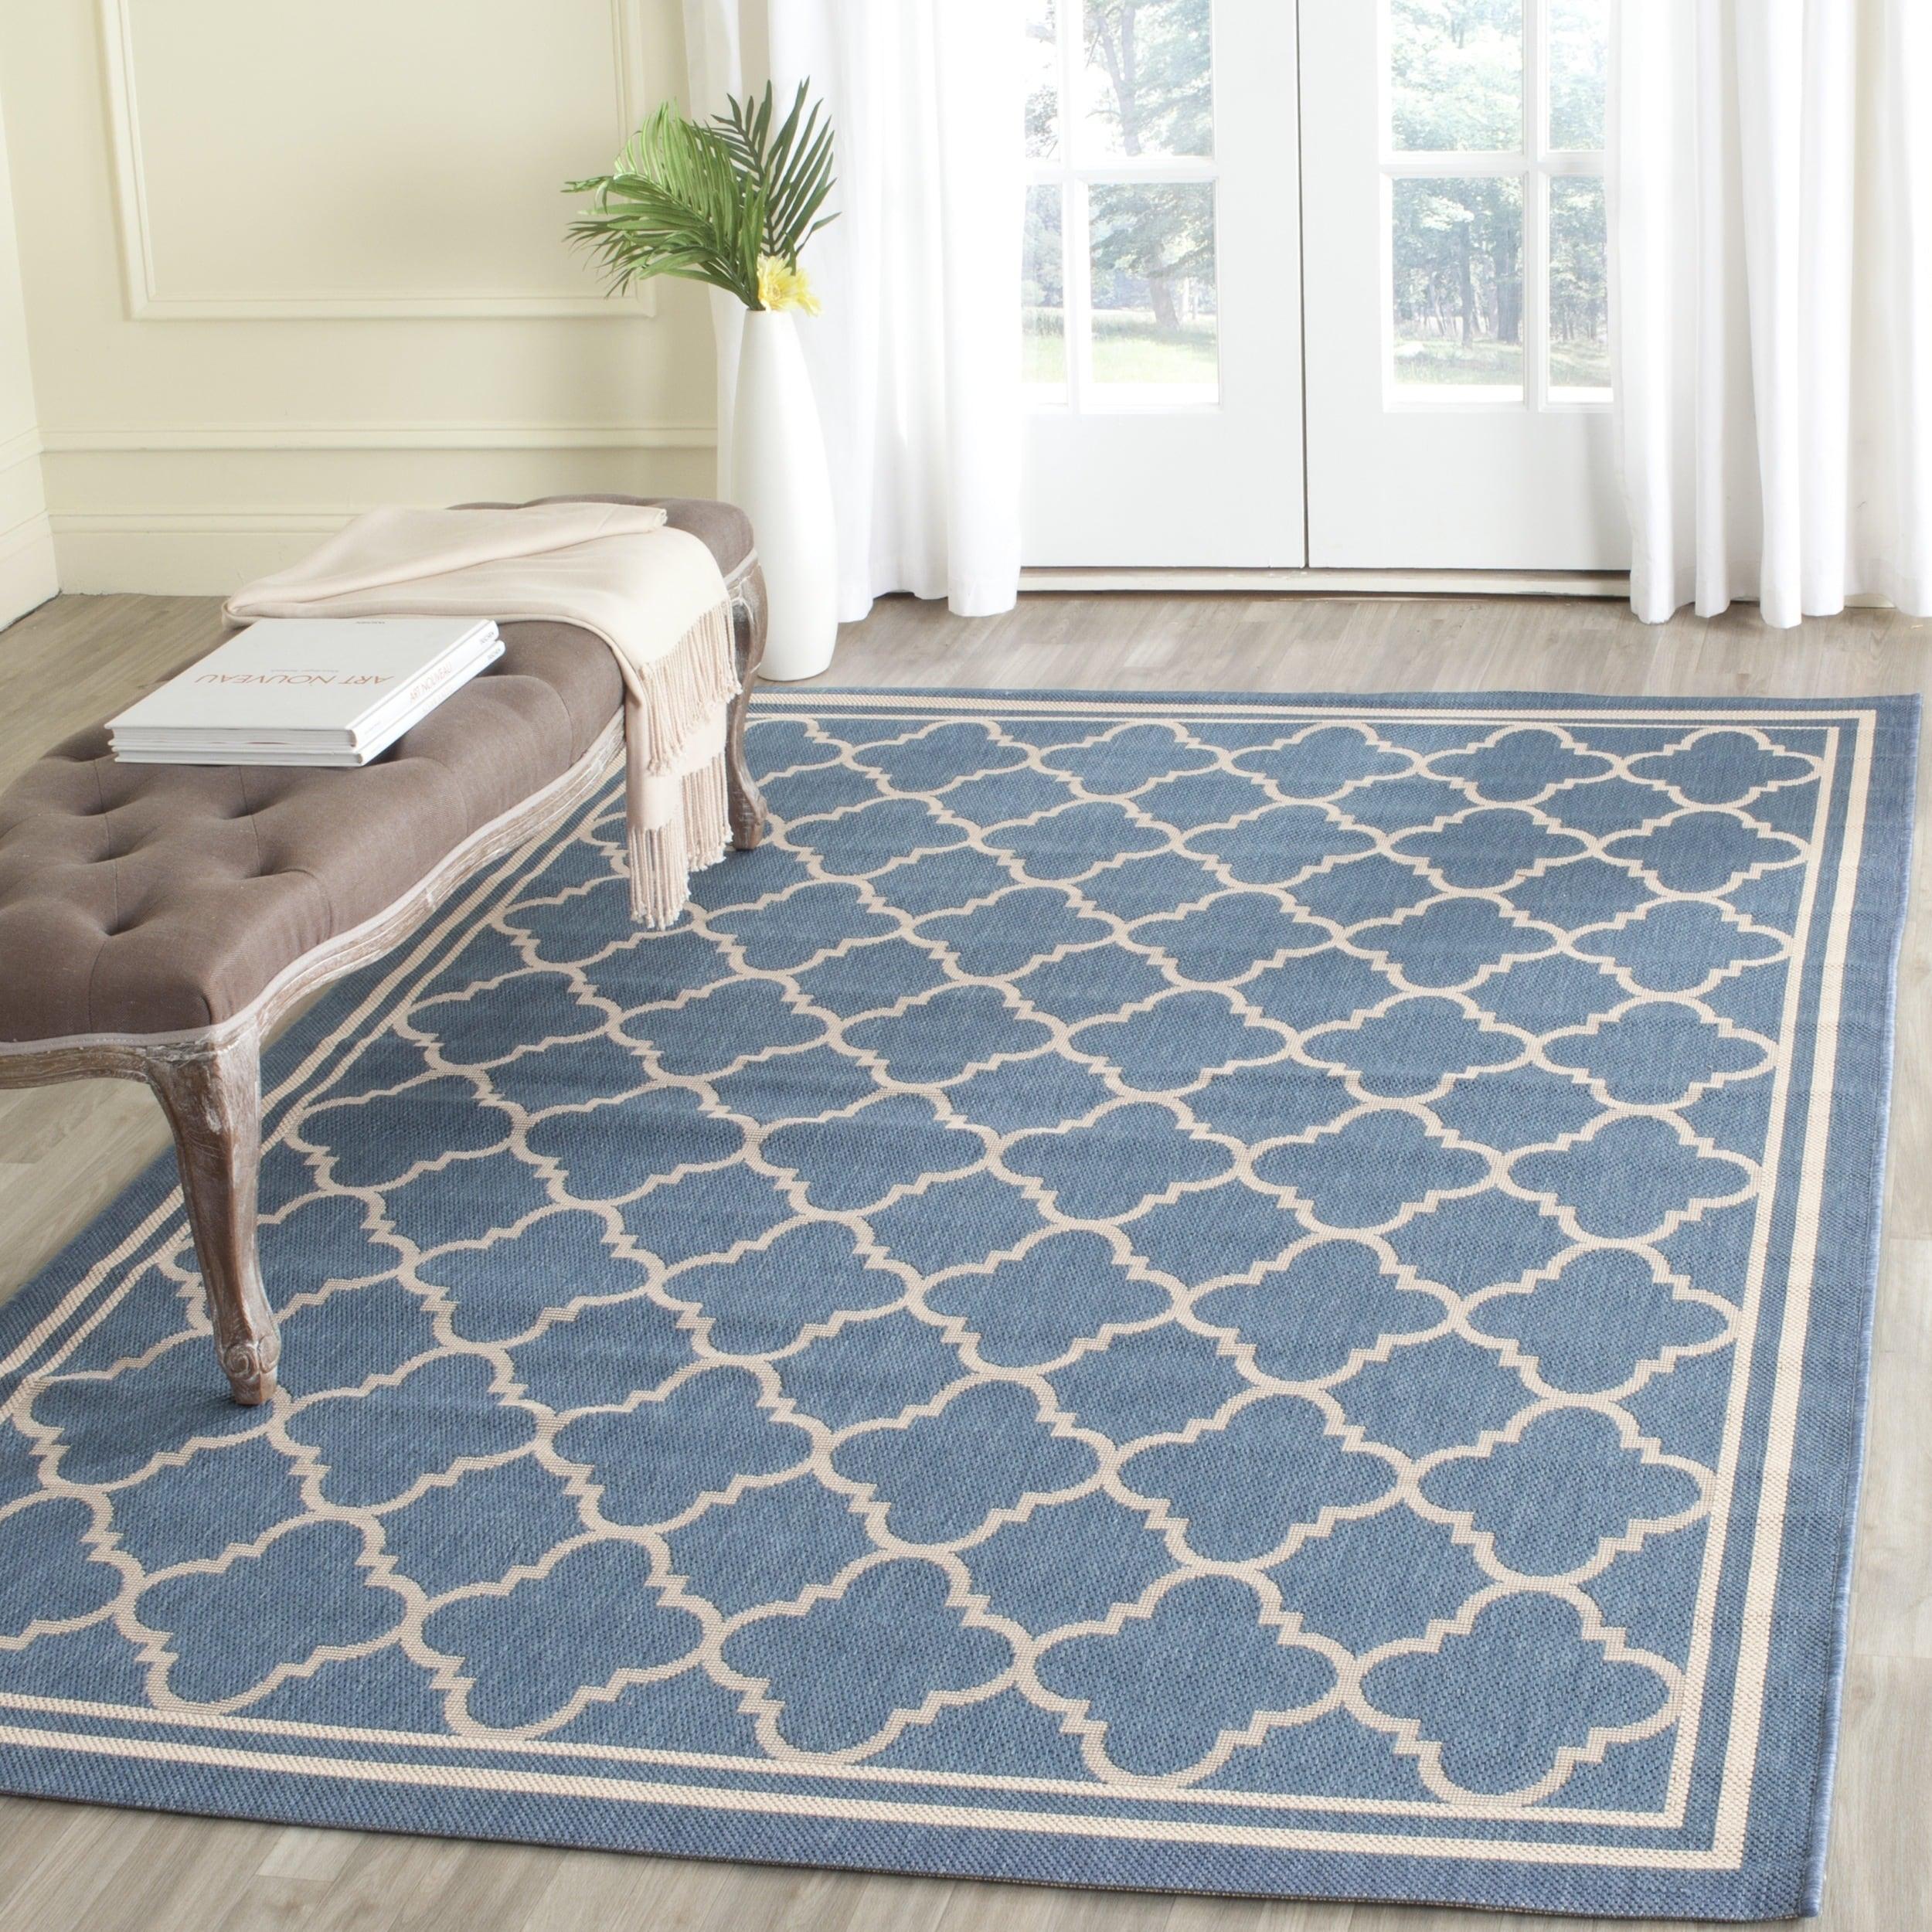 Safavieh Blue/ Beige Diamond Indoor/ Outdoor Rug (8' 11 x 12' rectangle) -  Free Shipping Today - Overstock.com - 14099327